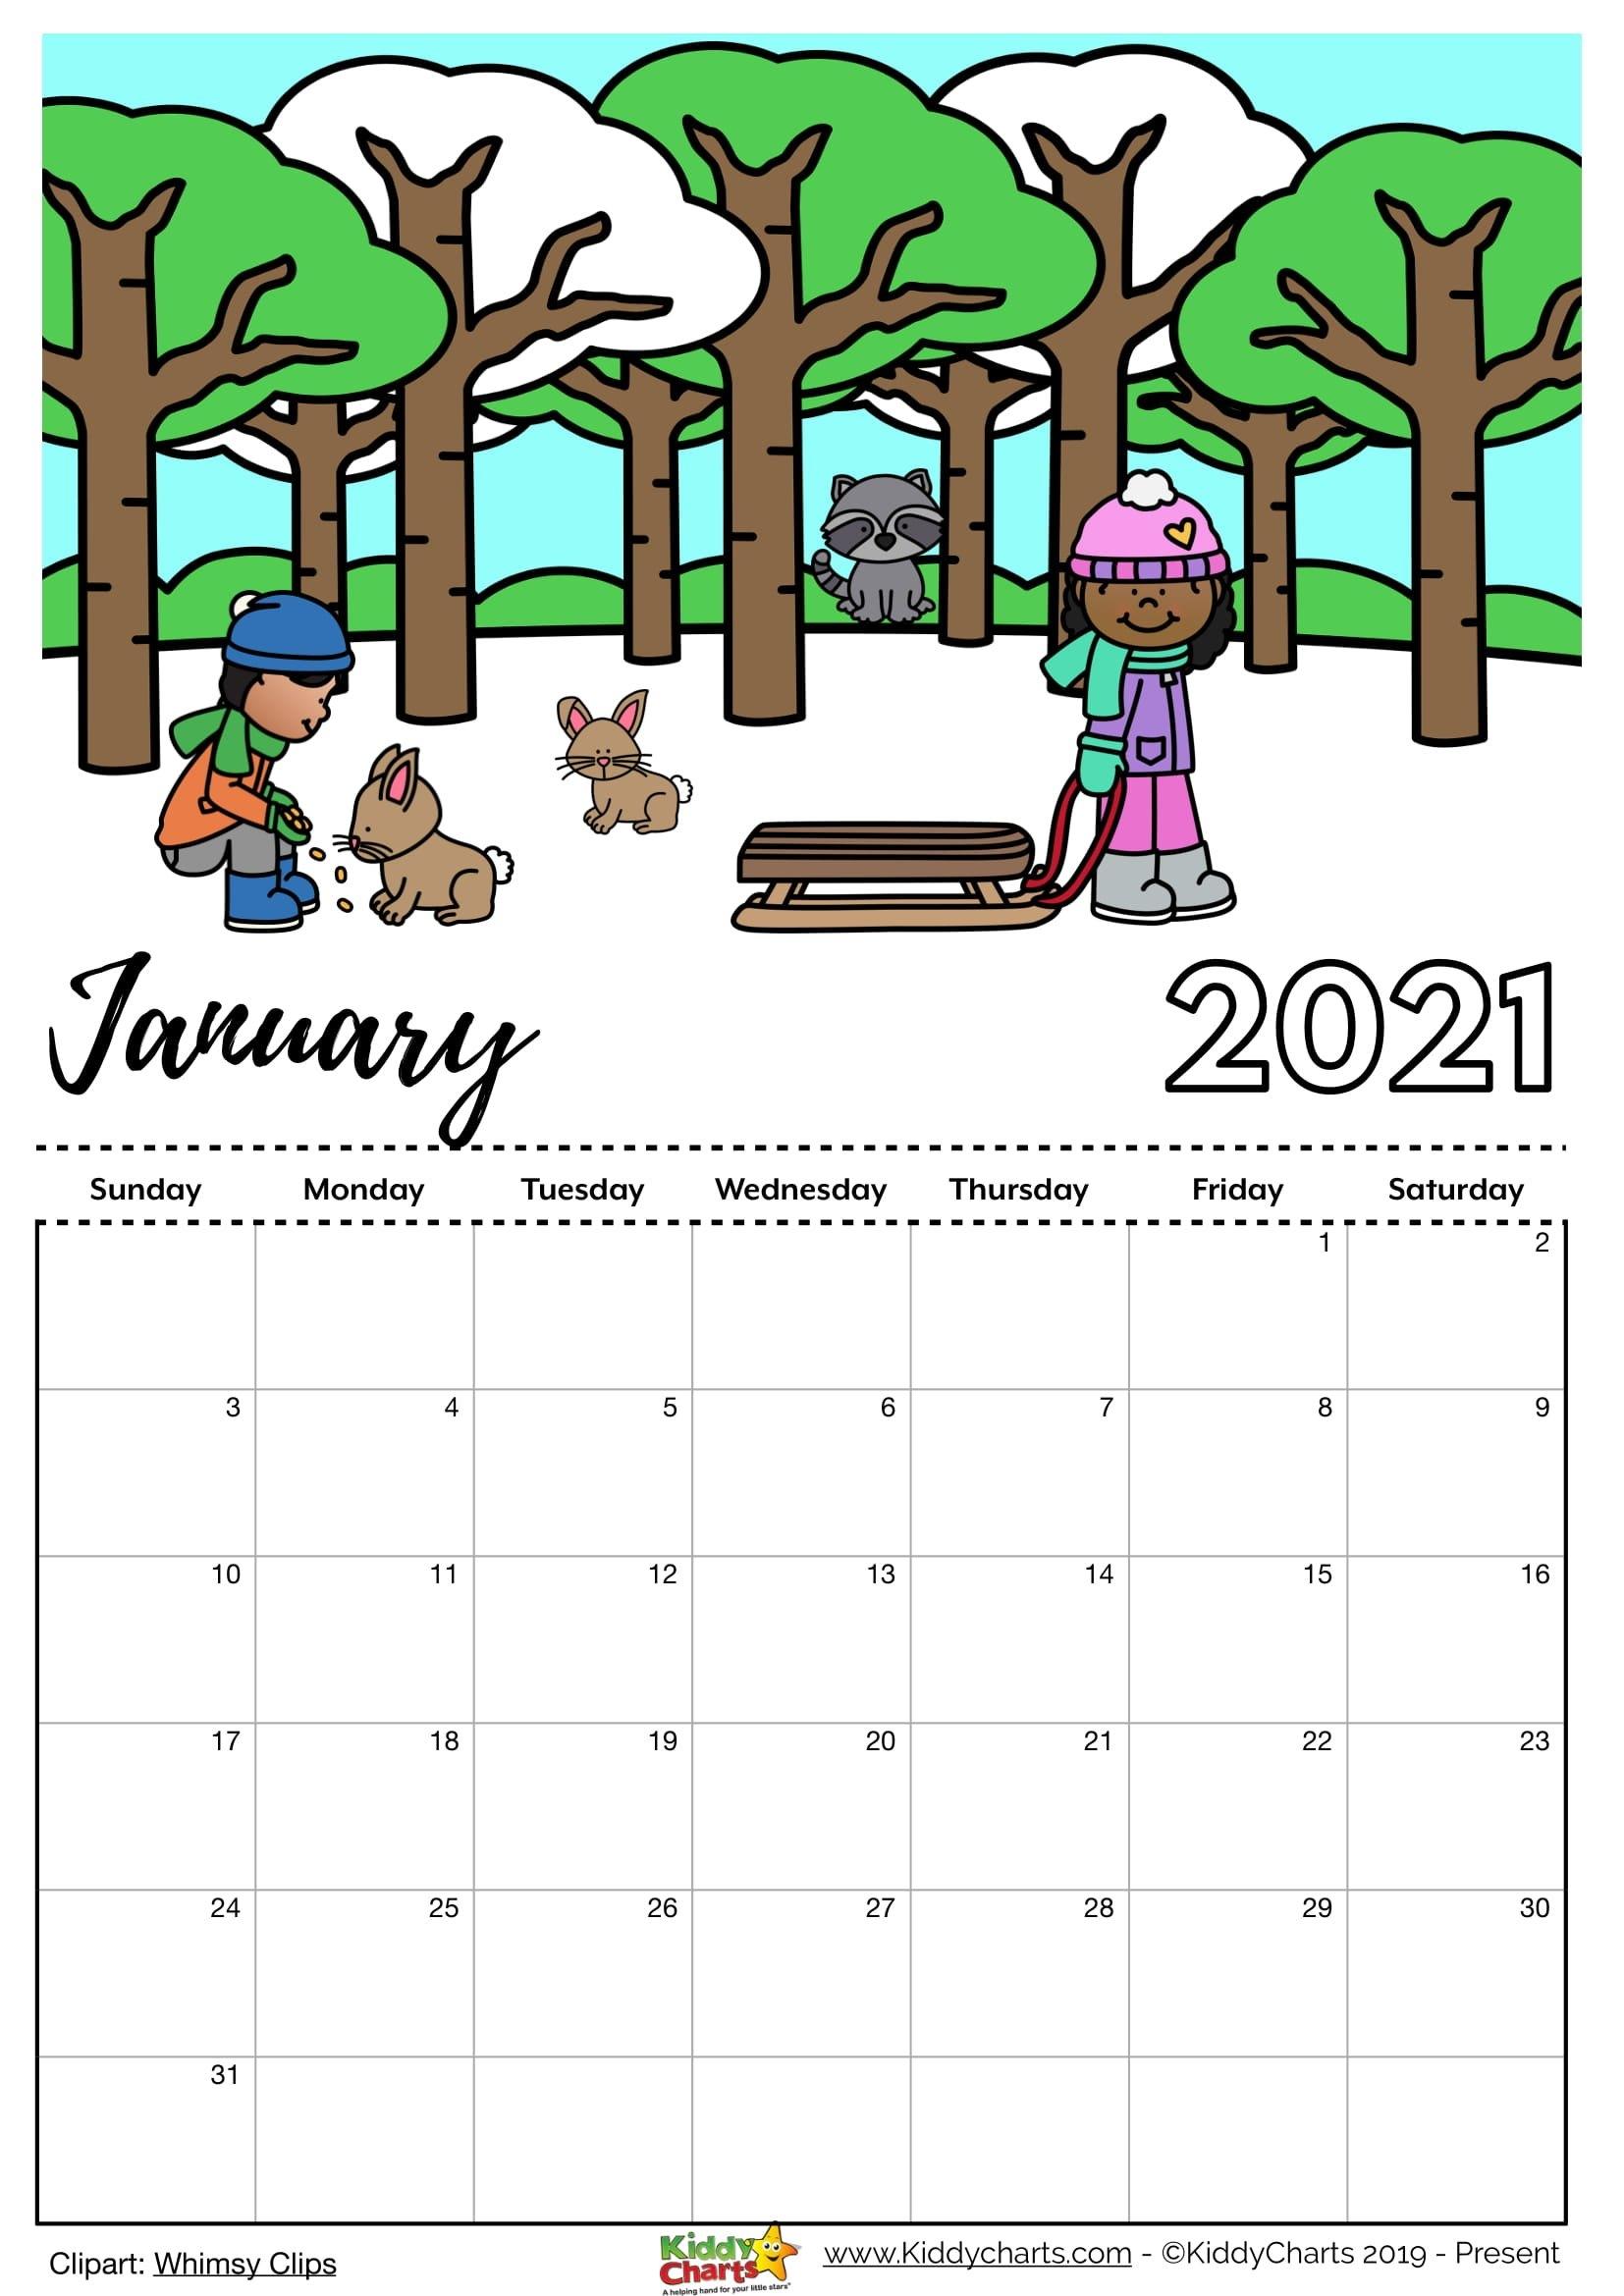 Free Editable Weekly 2021 Calendar - Free Printable 2021 Calendar: Includes Editable Version with regard to Print Calendar 2021 Monthly Free Photo